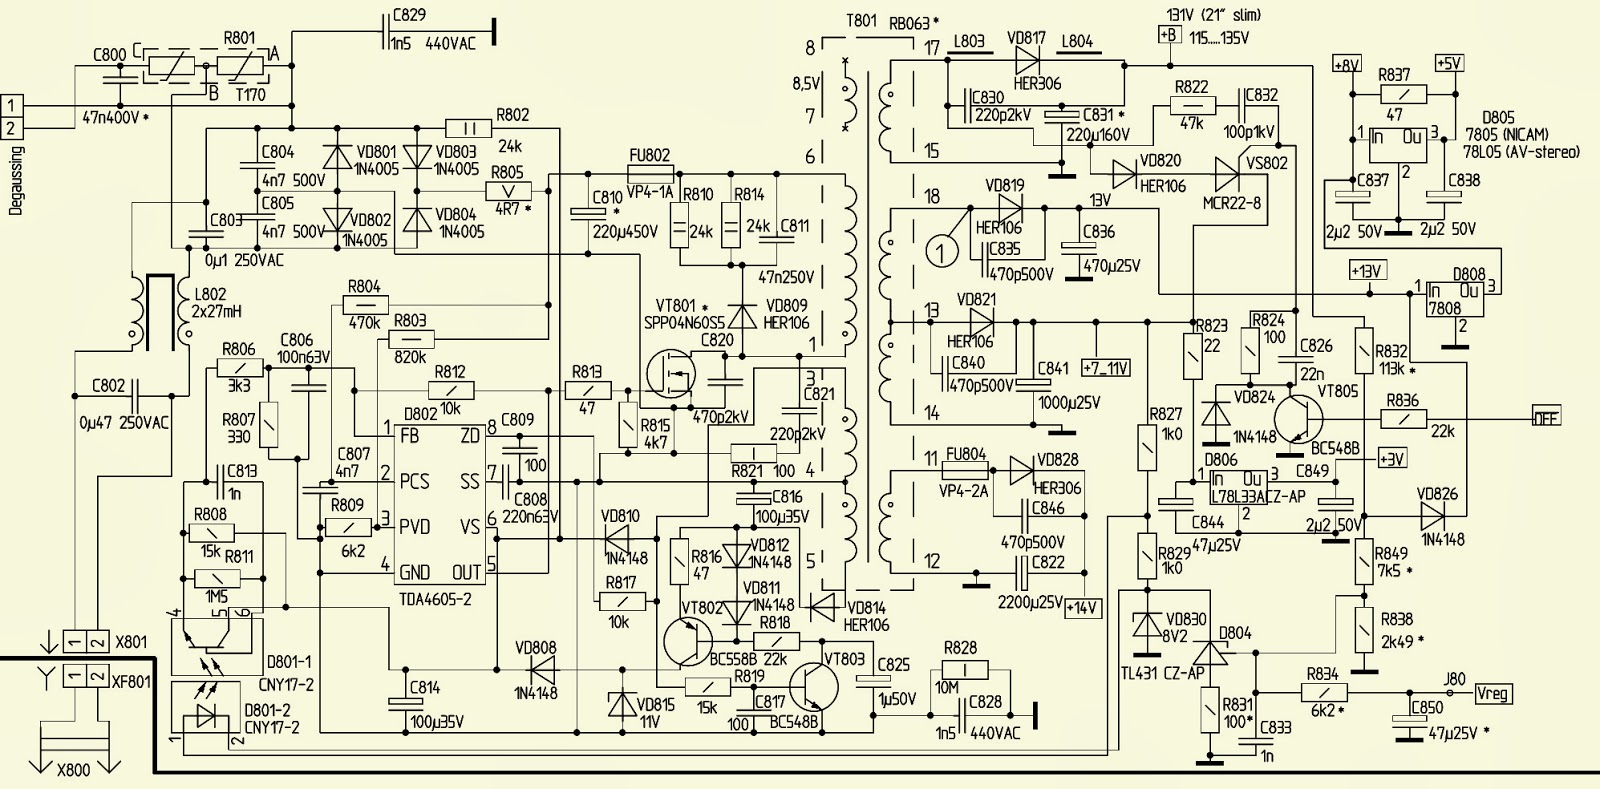 Smps Schematic Diagram 2005 Jeep Grand Cherokee Car Stereo Wiring 21ct05fs  25ct06fs 29ct07fs Akai Tv